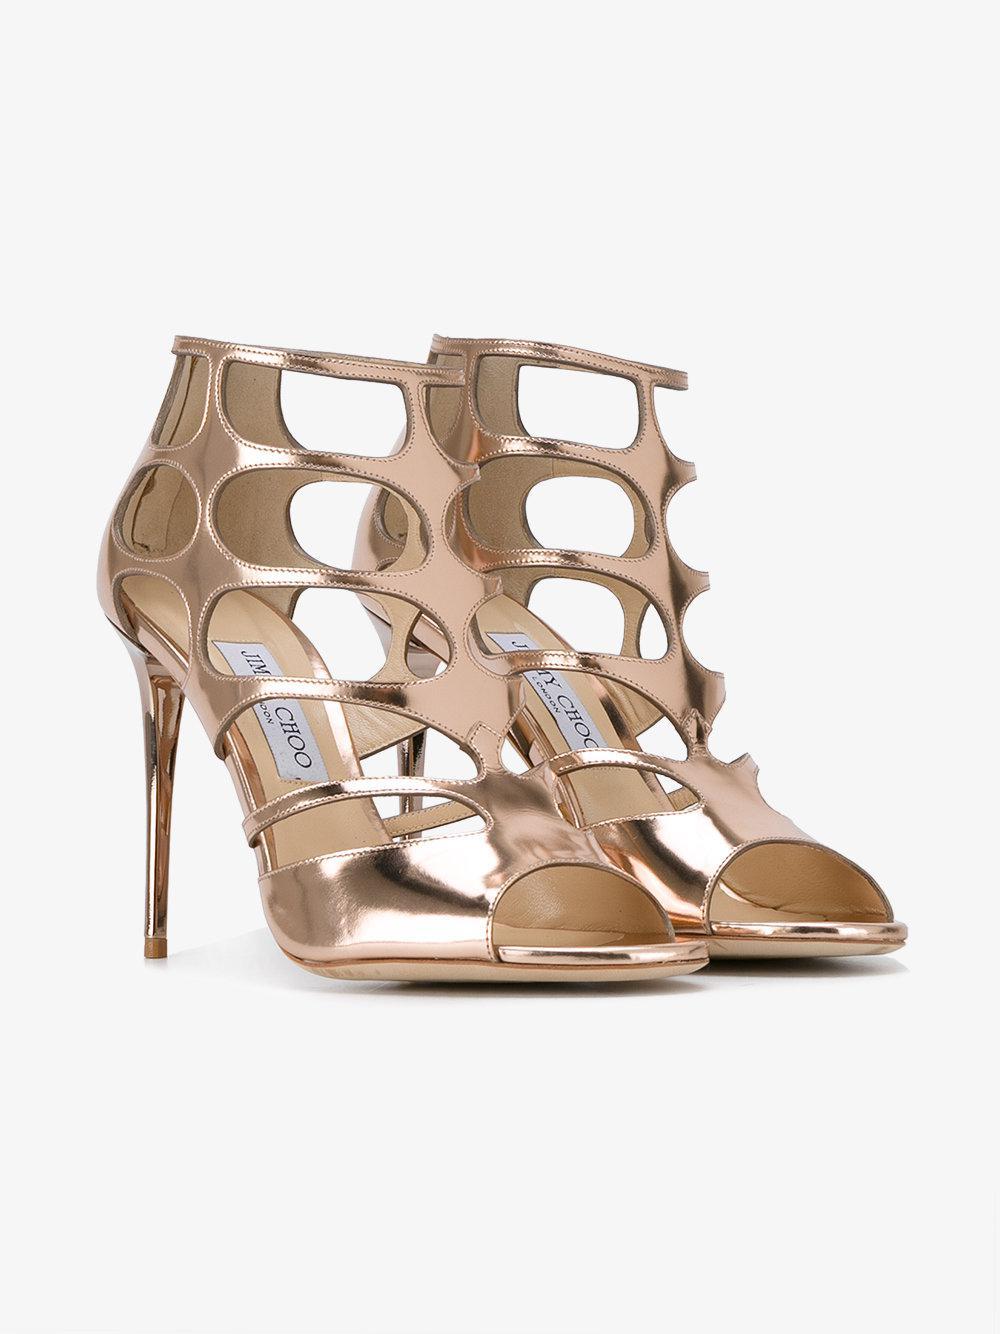 ff8b572a69e Lyst - Jimmy Choo Ren 85 Caged Sandals in Metallic